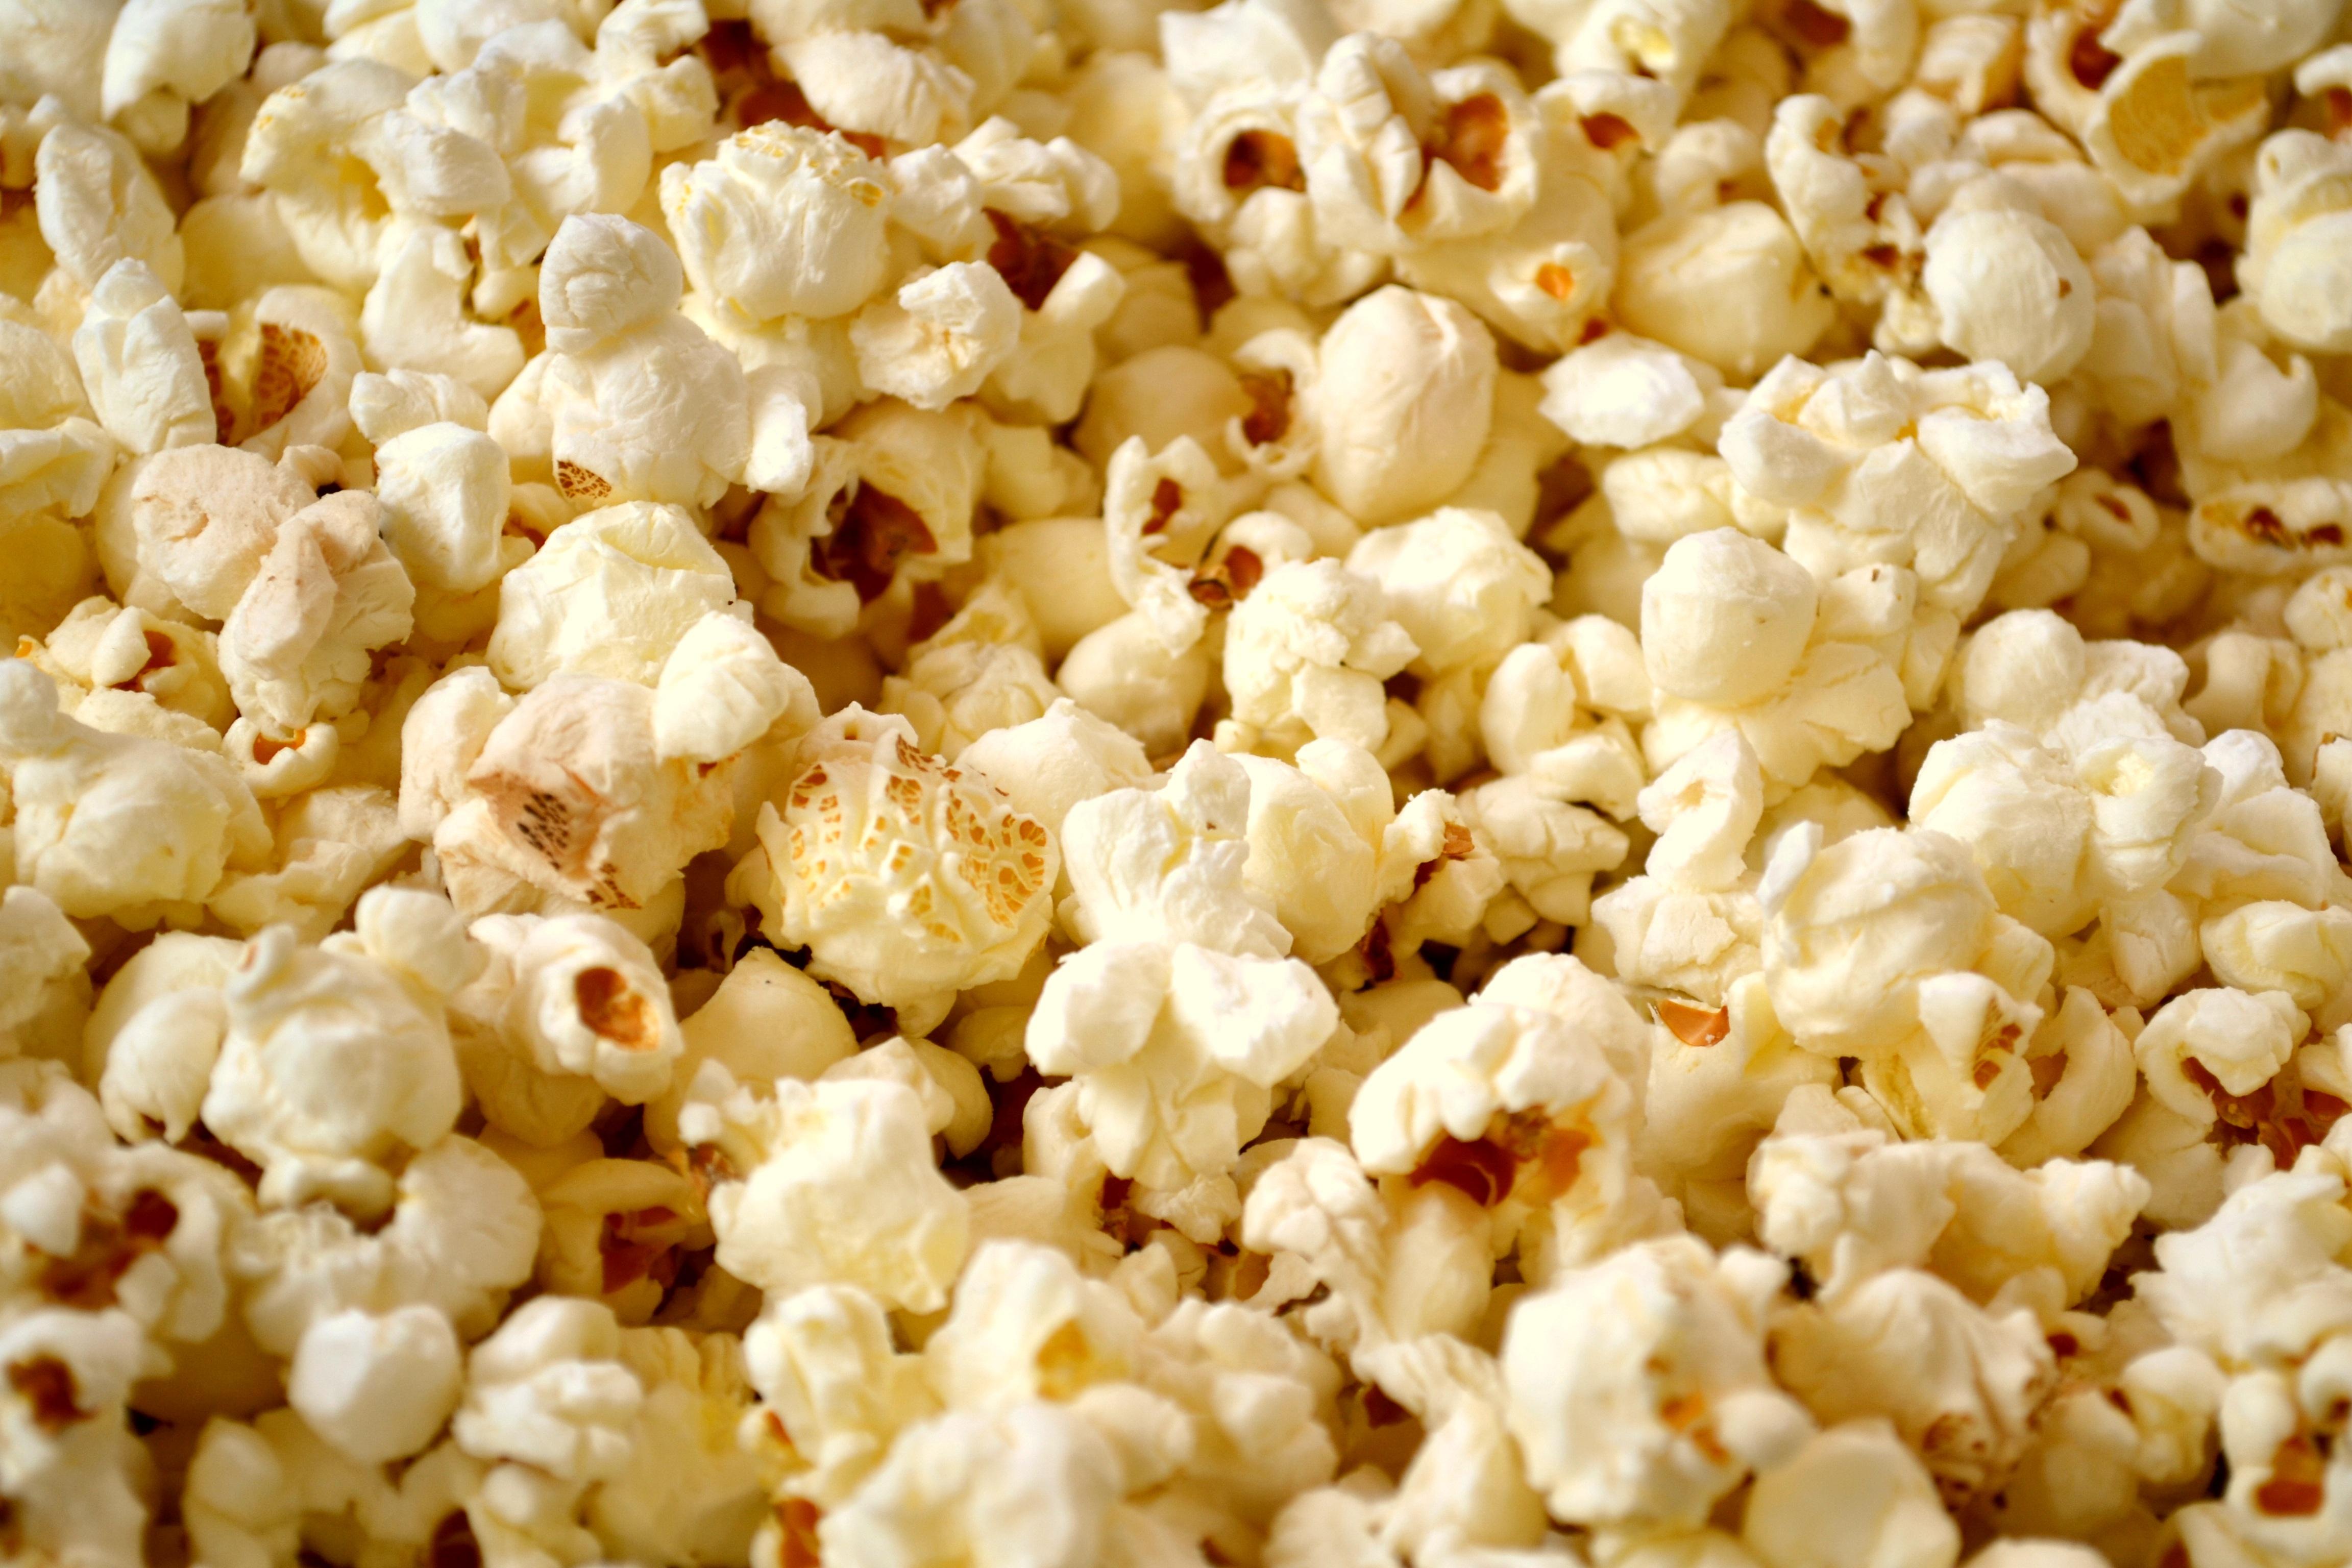 A Snack Of Delicious Popcorn 4k Ultra Hd Wallpaper